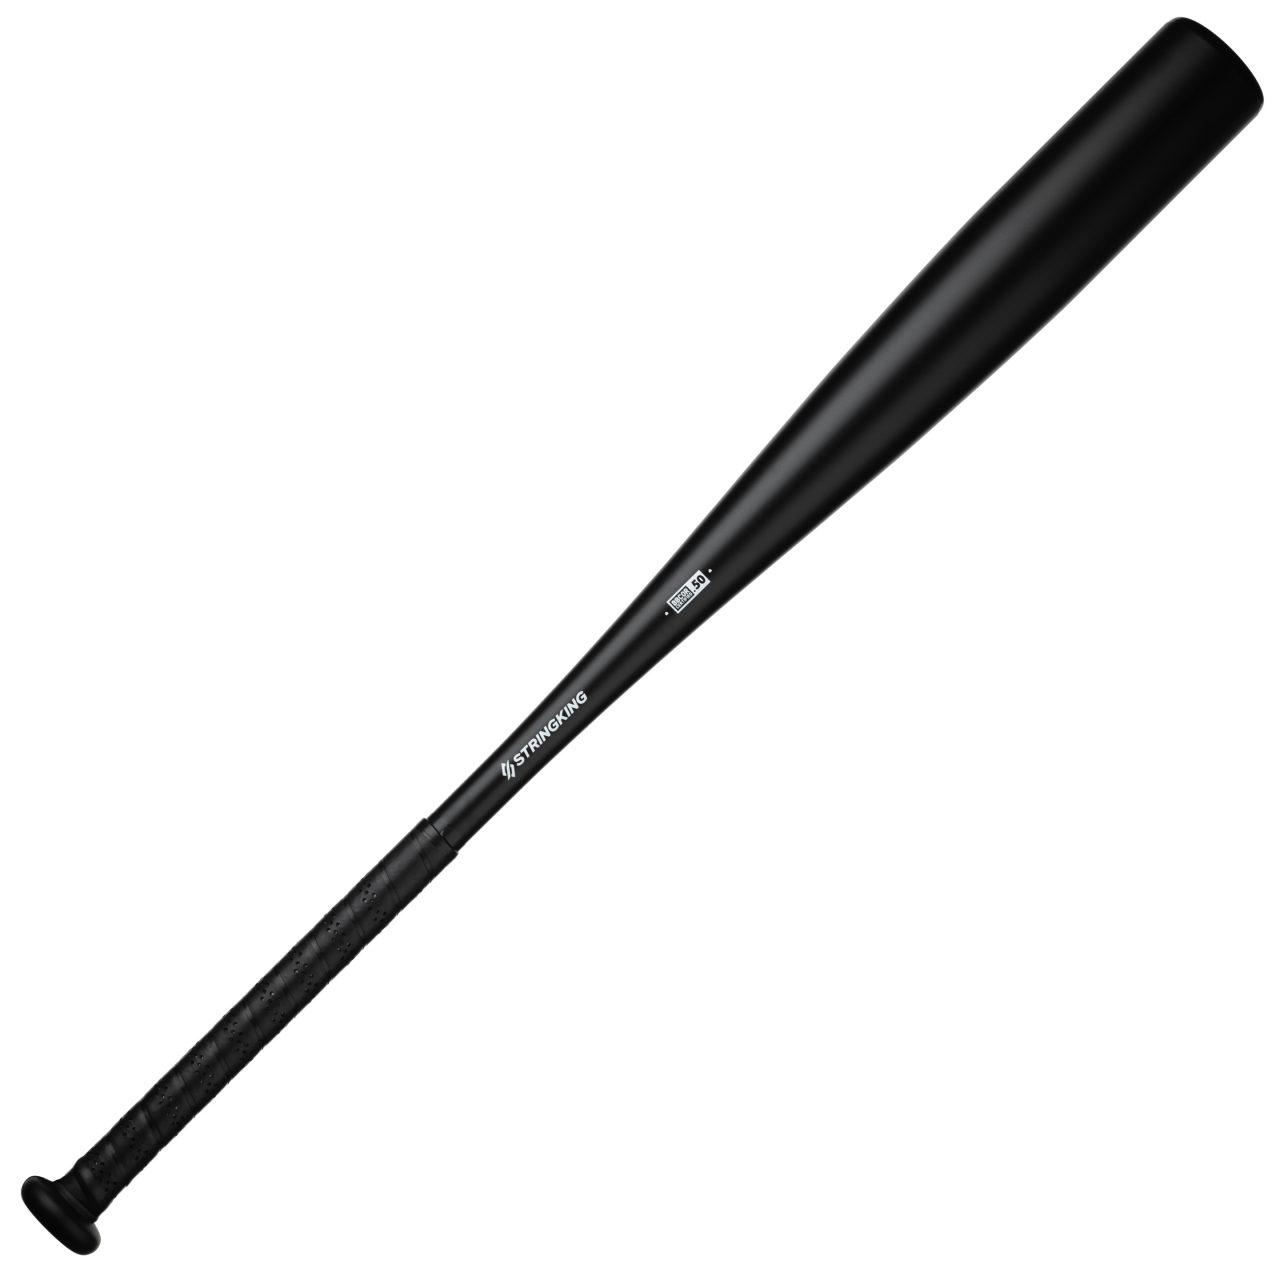 StringKing Metal Pro BBCOR Baseball Bat Full View